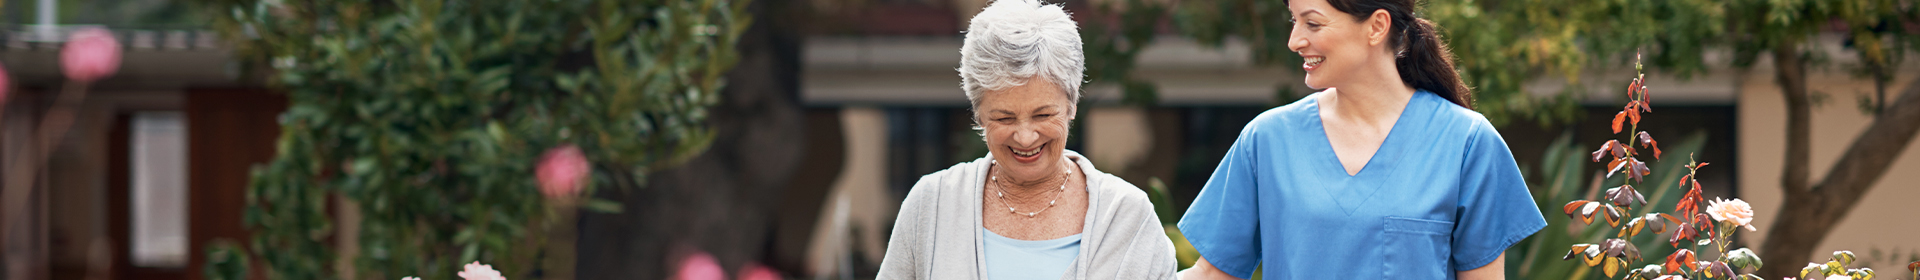 Starsza kobieta i opiekunka